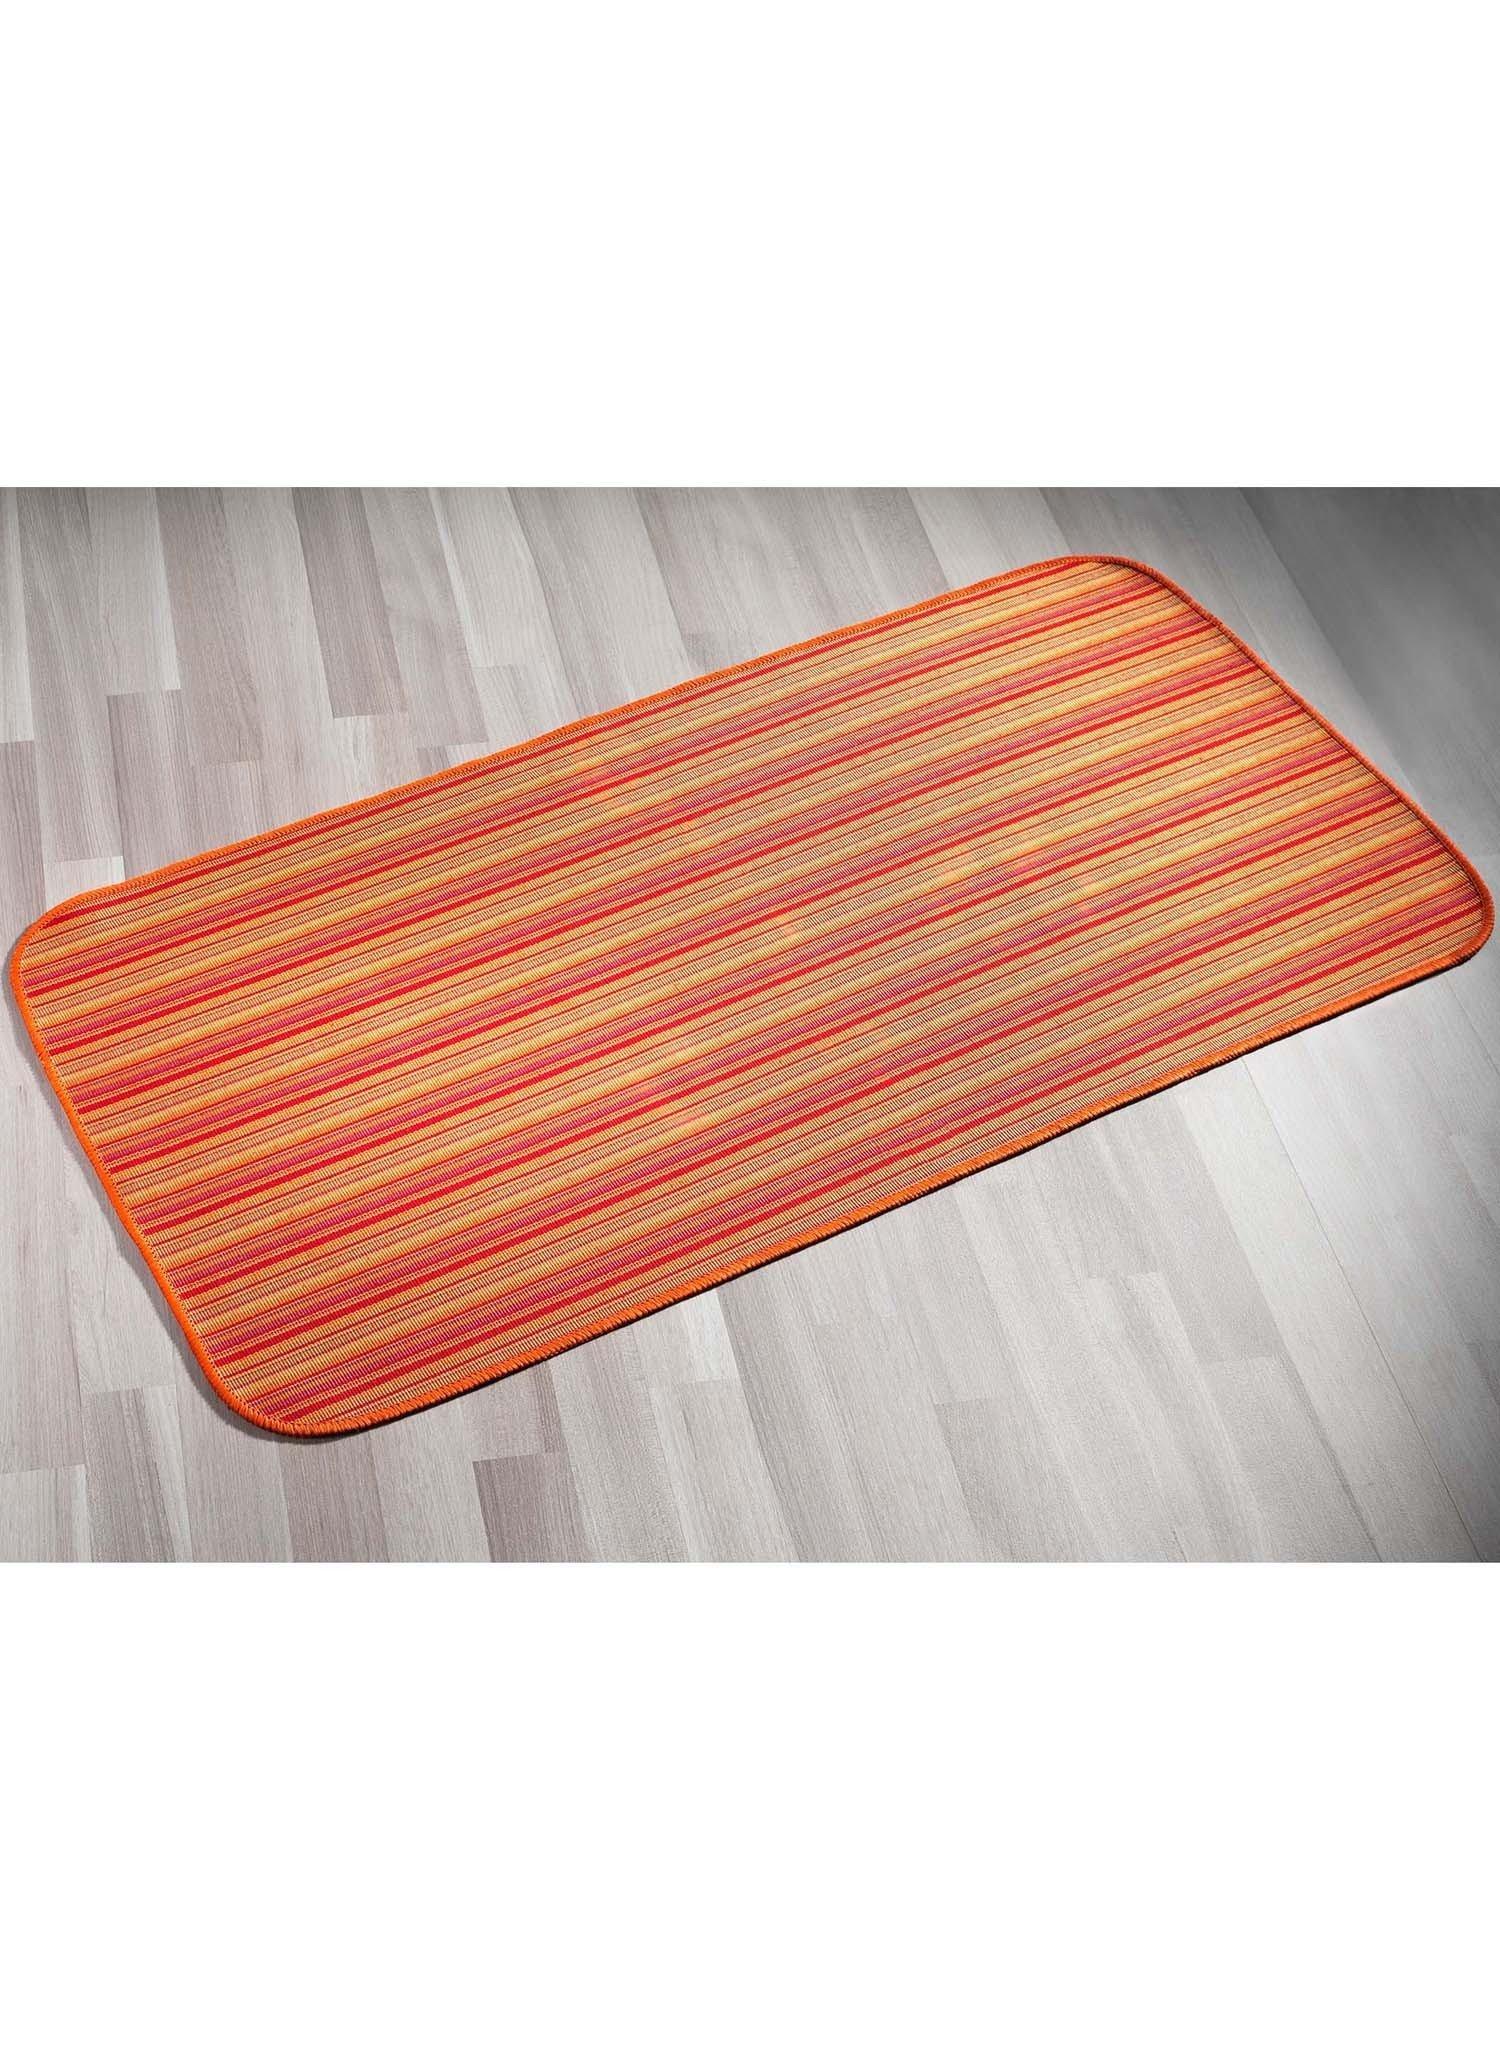 Küchen/Al.Teppich 57x115 orang